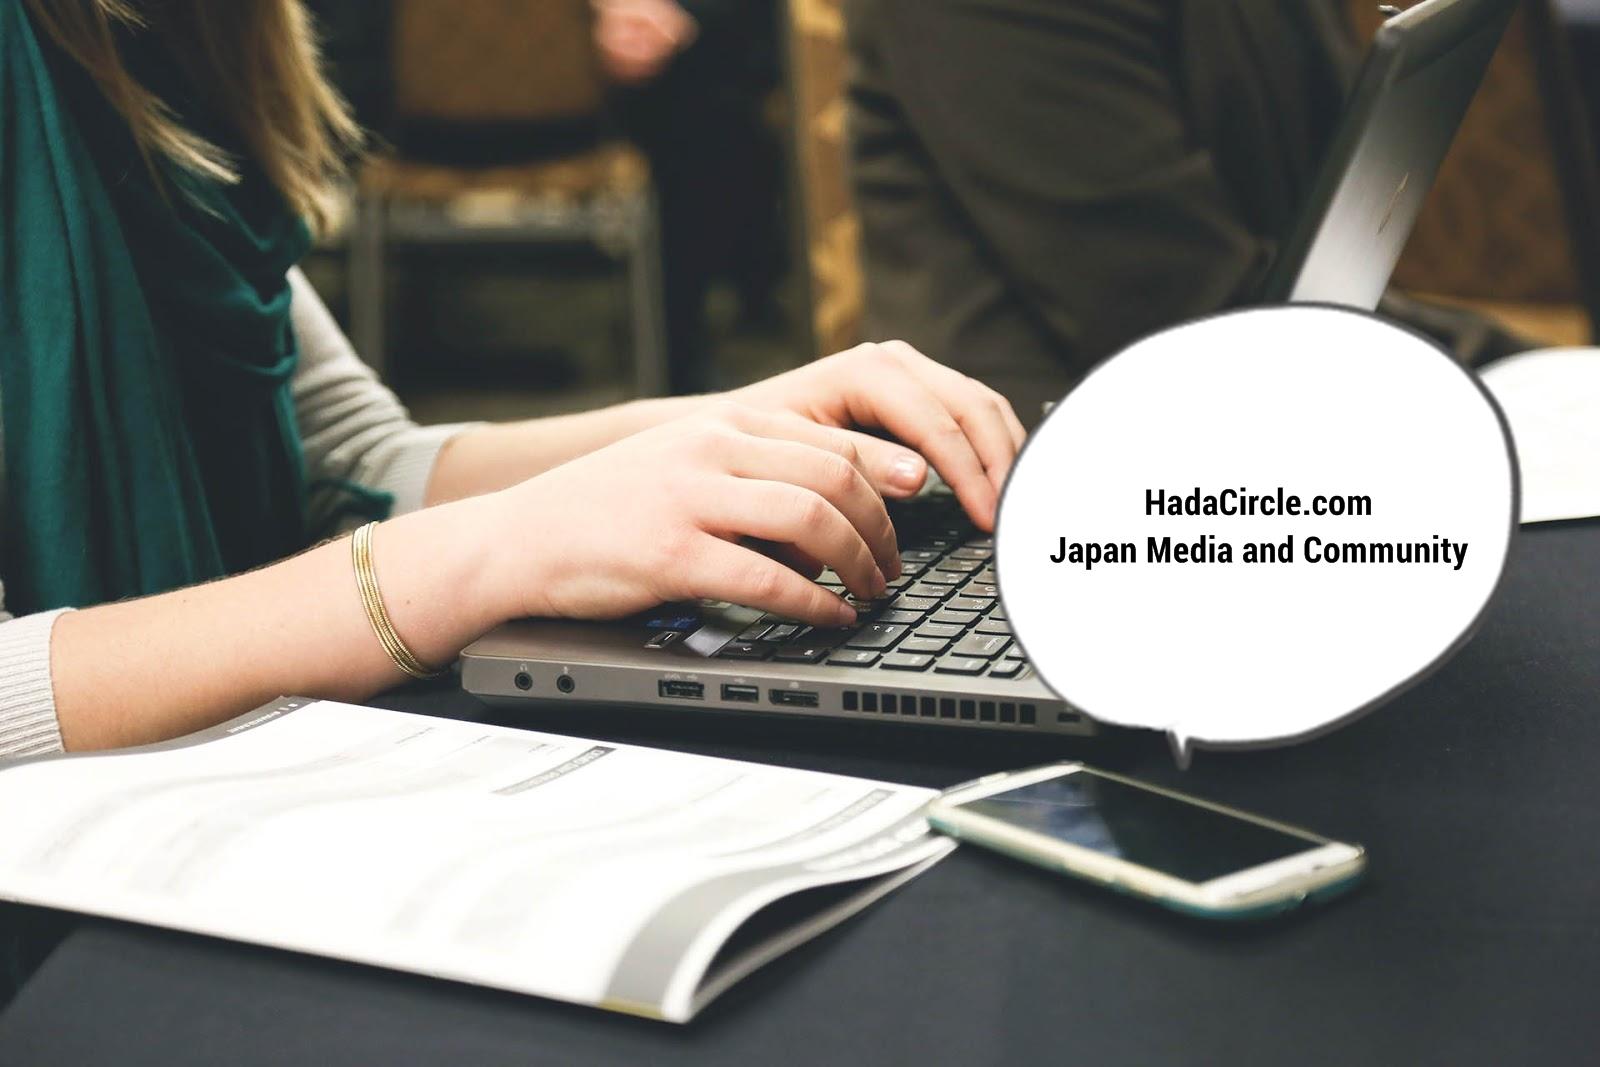 HadaCircle.com